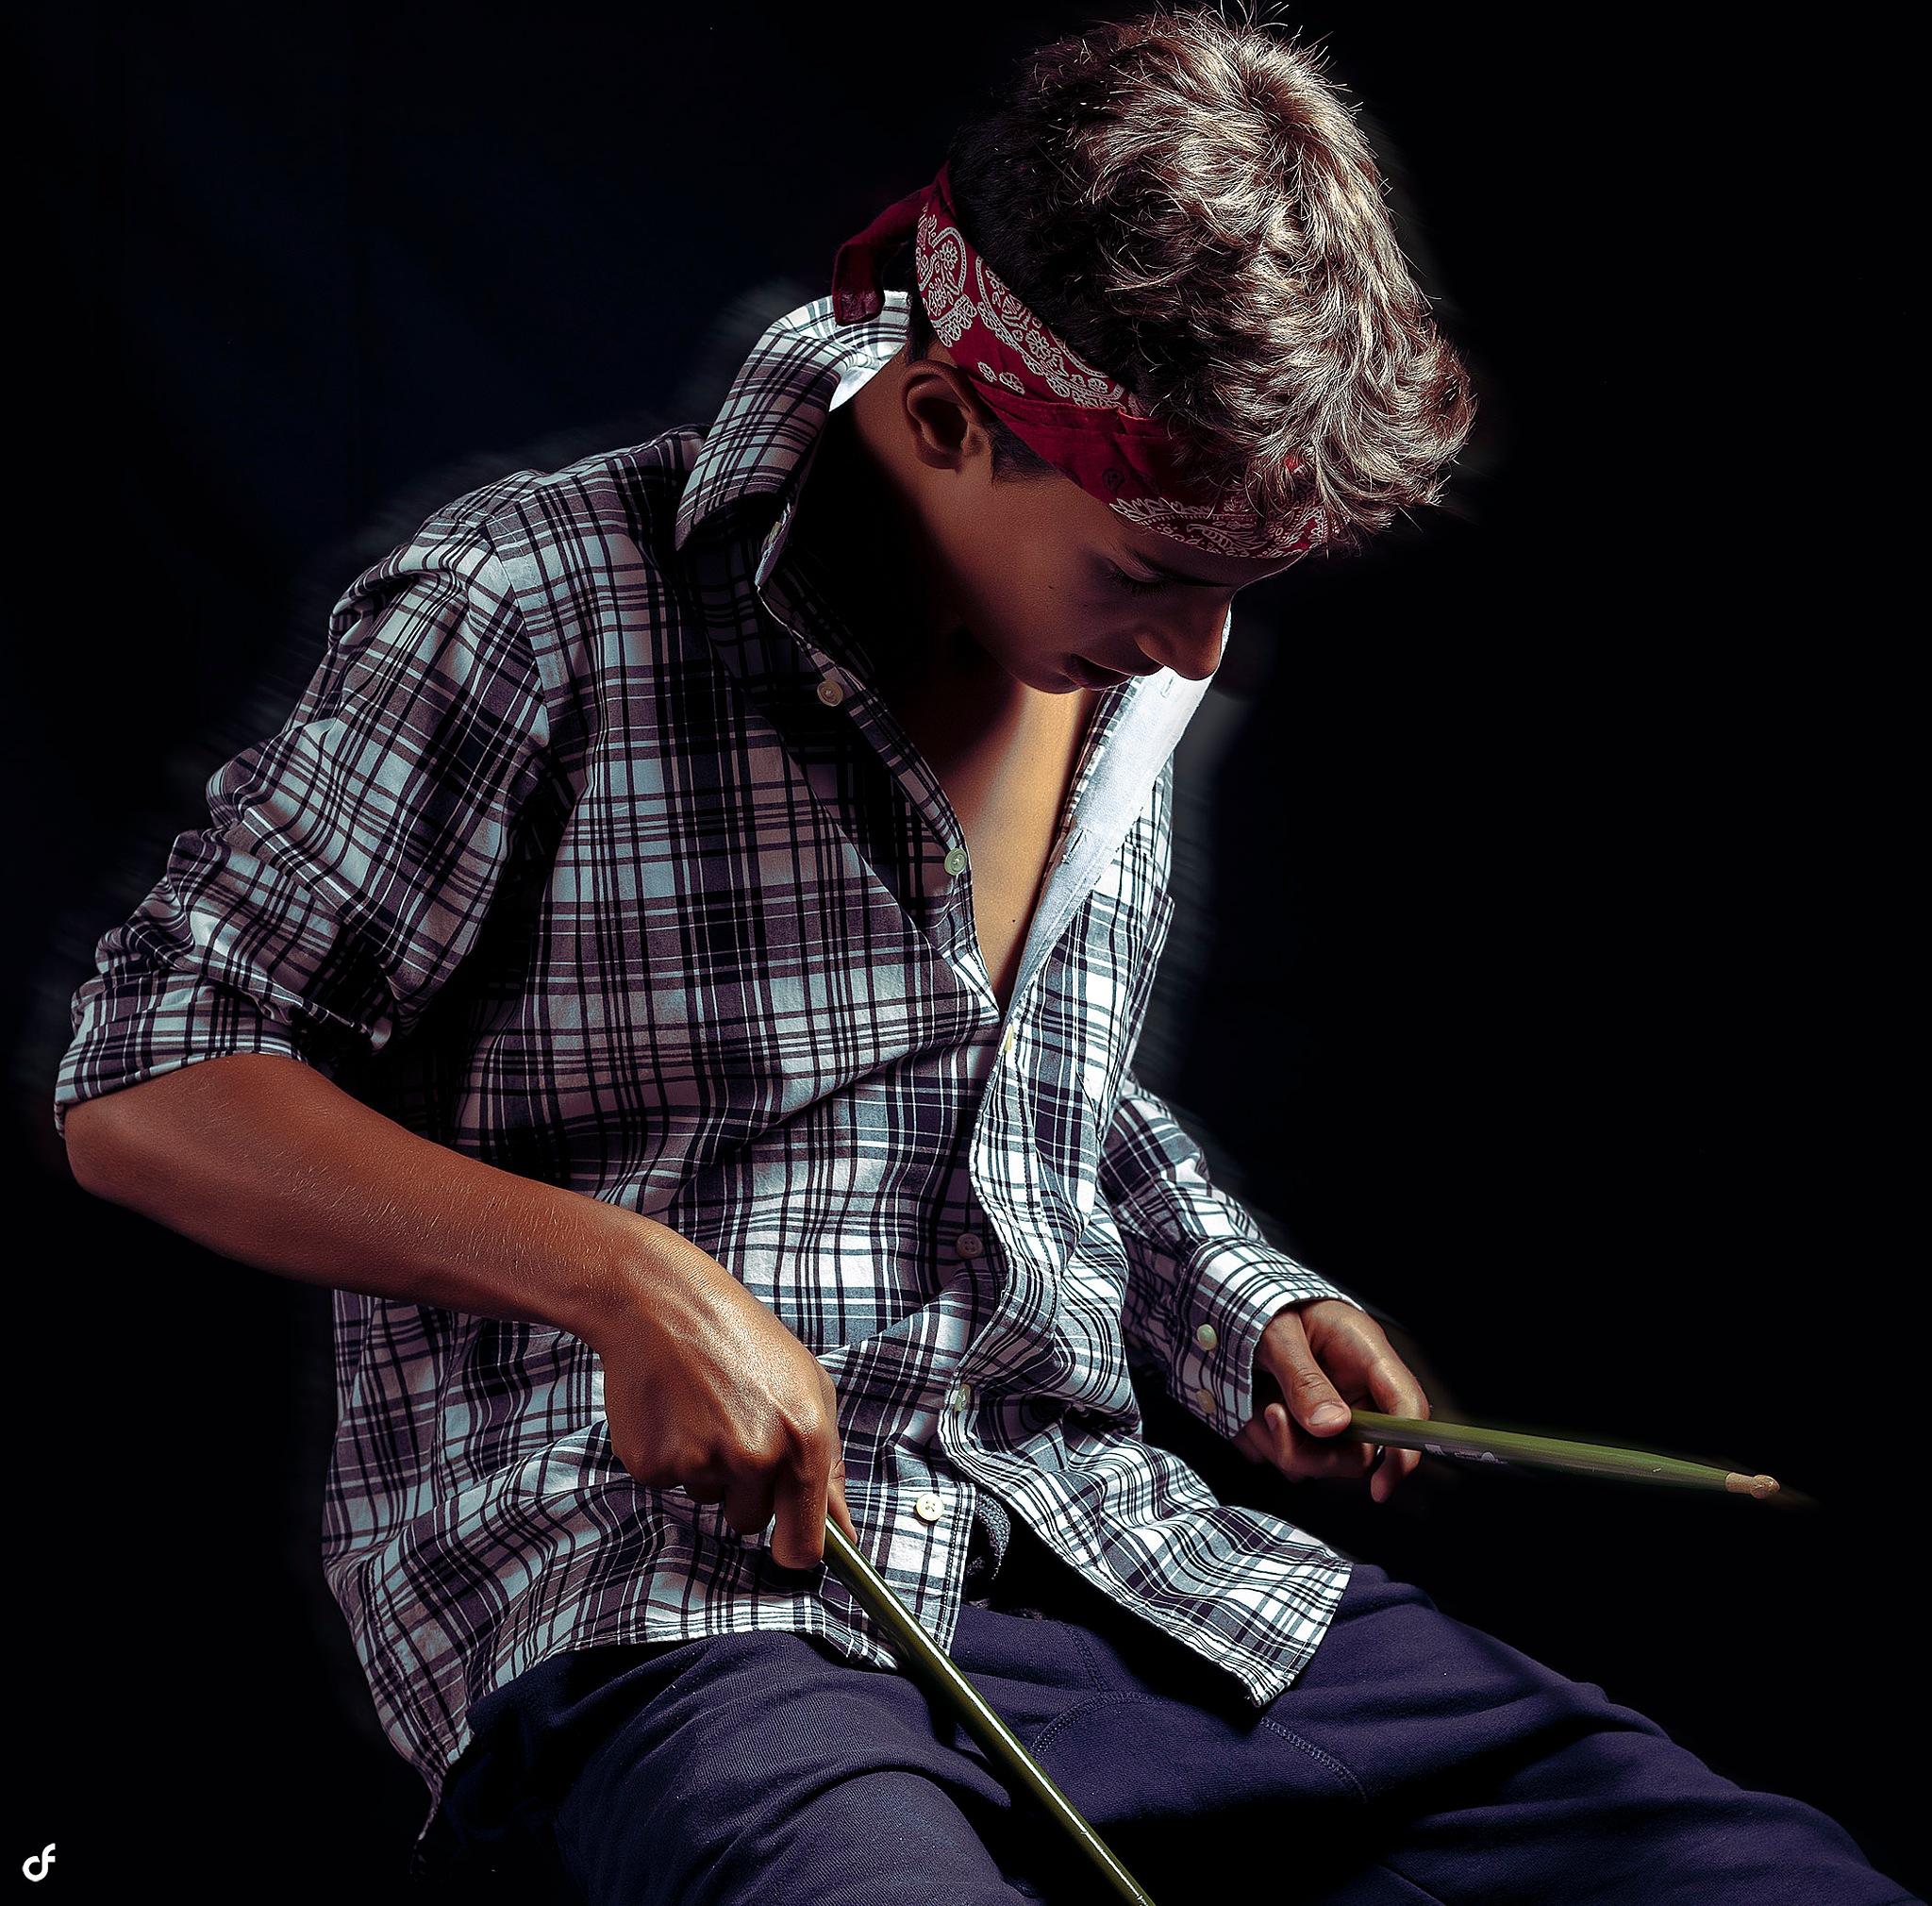 The Drummer II by Daniel Frias